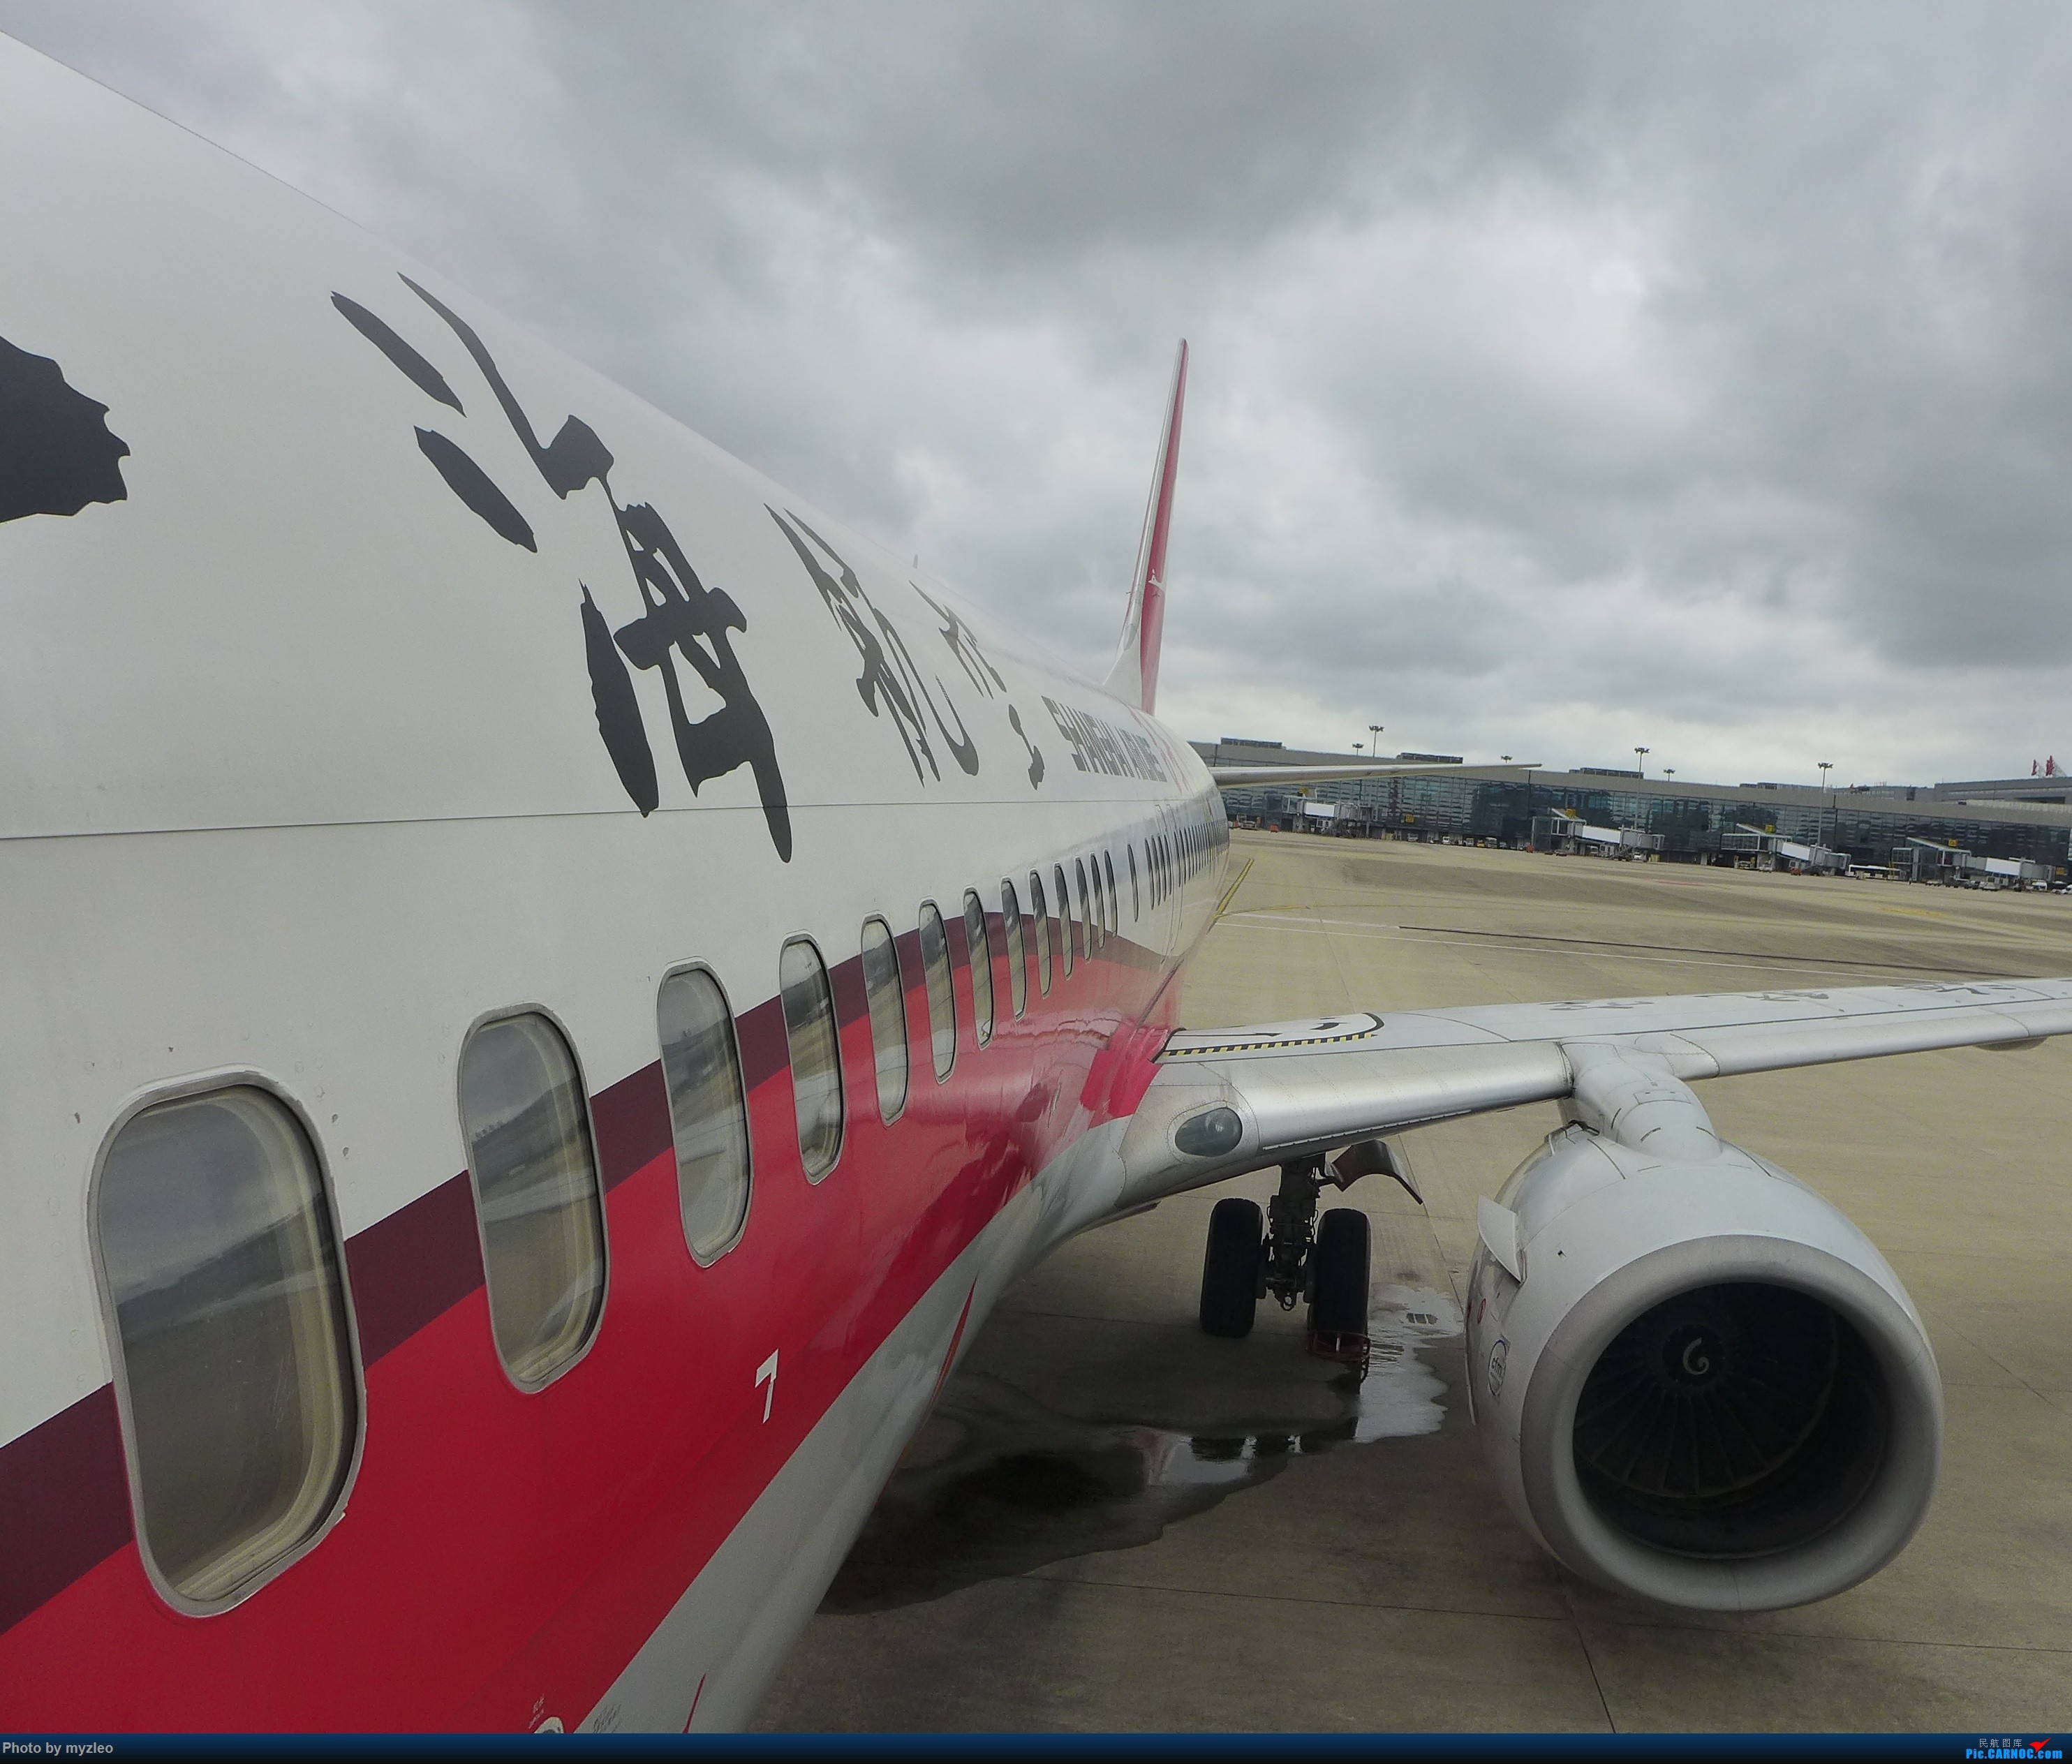 Re:[原创]【myzleo的游记2.1】昆洱风光(1)——SHA-KMG上航商务舱再体验+人在昆明 BOEING 737-800 B-5132 中国上海虹桥国际机场